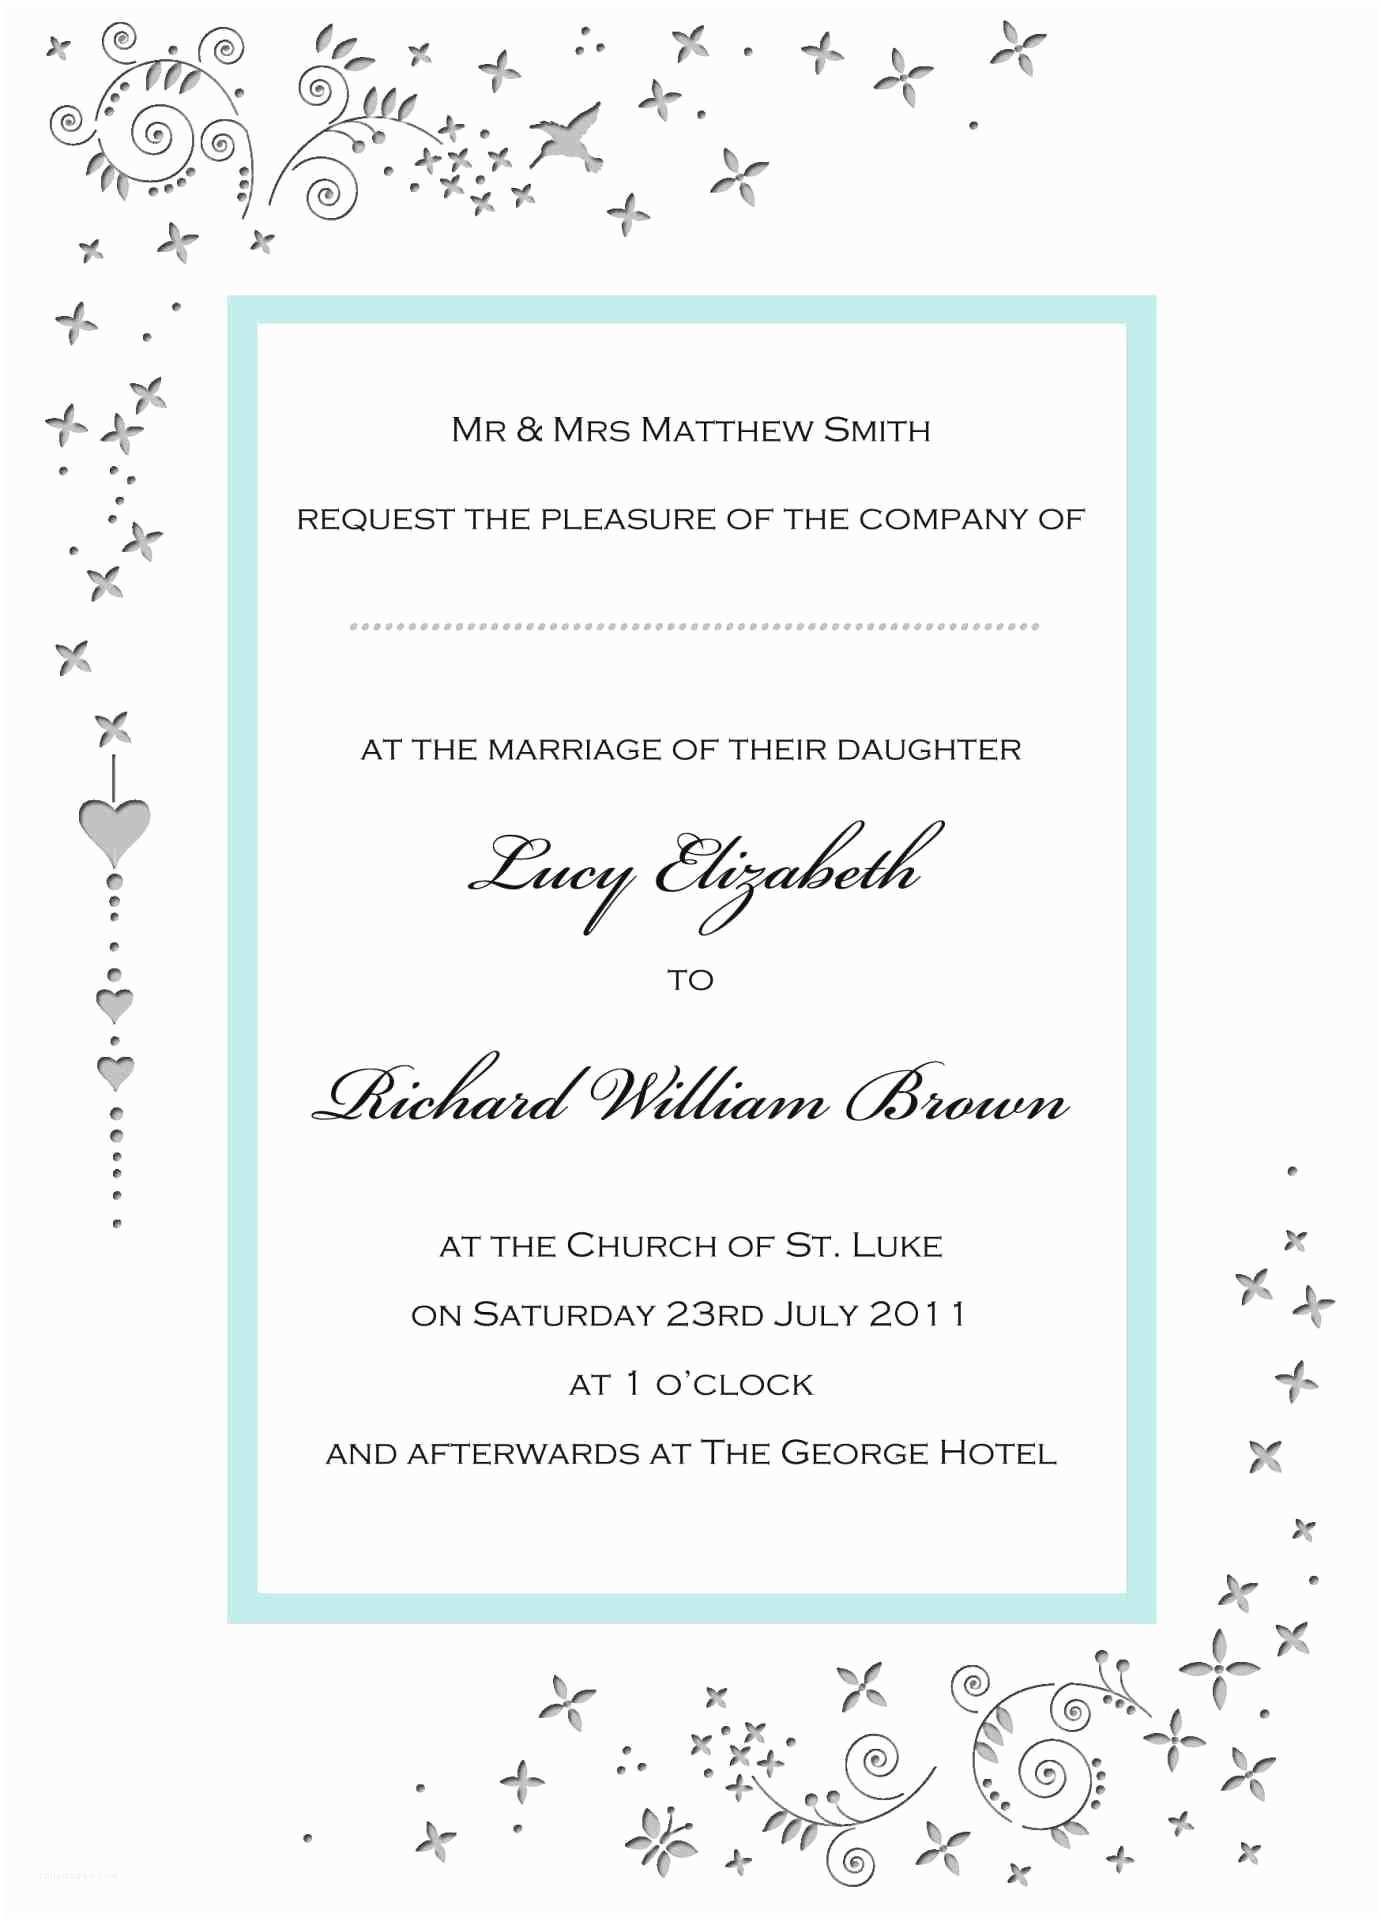 Wedding Invitation Wording Samples Modern Wedding Invitation Wording Samples